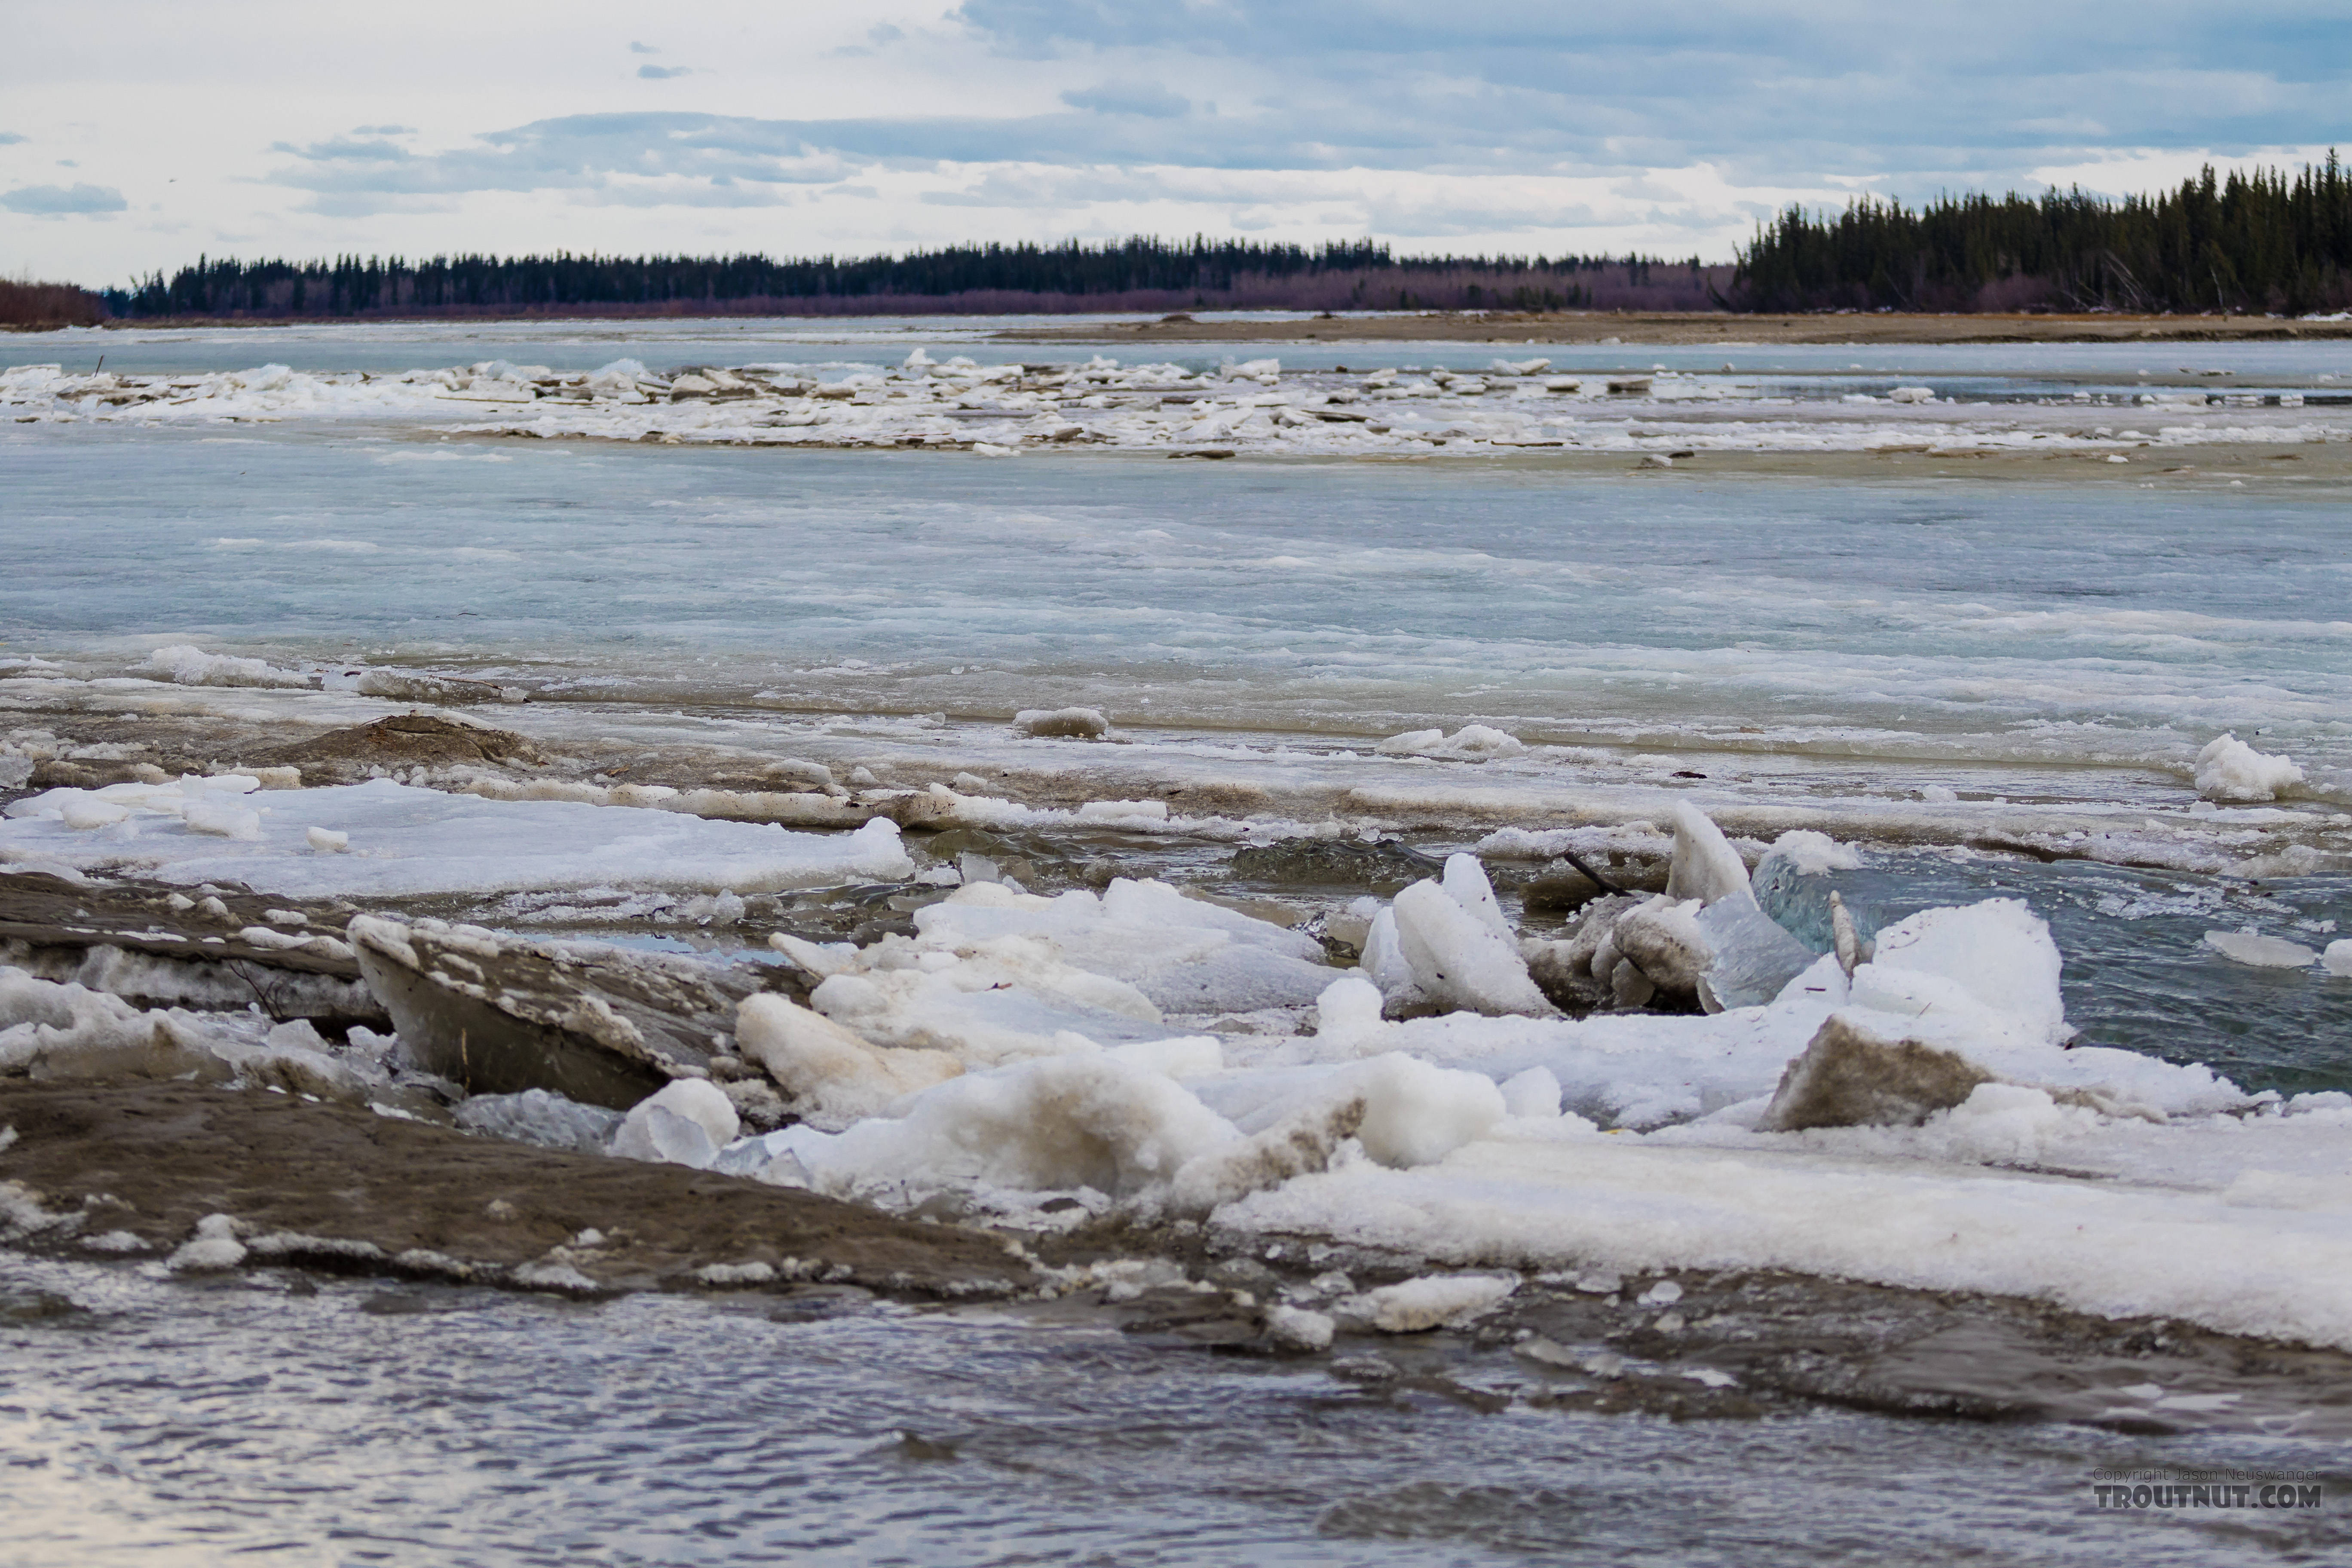 Ice breakup on the Tanana From the Tanana River in Alaska.